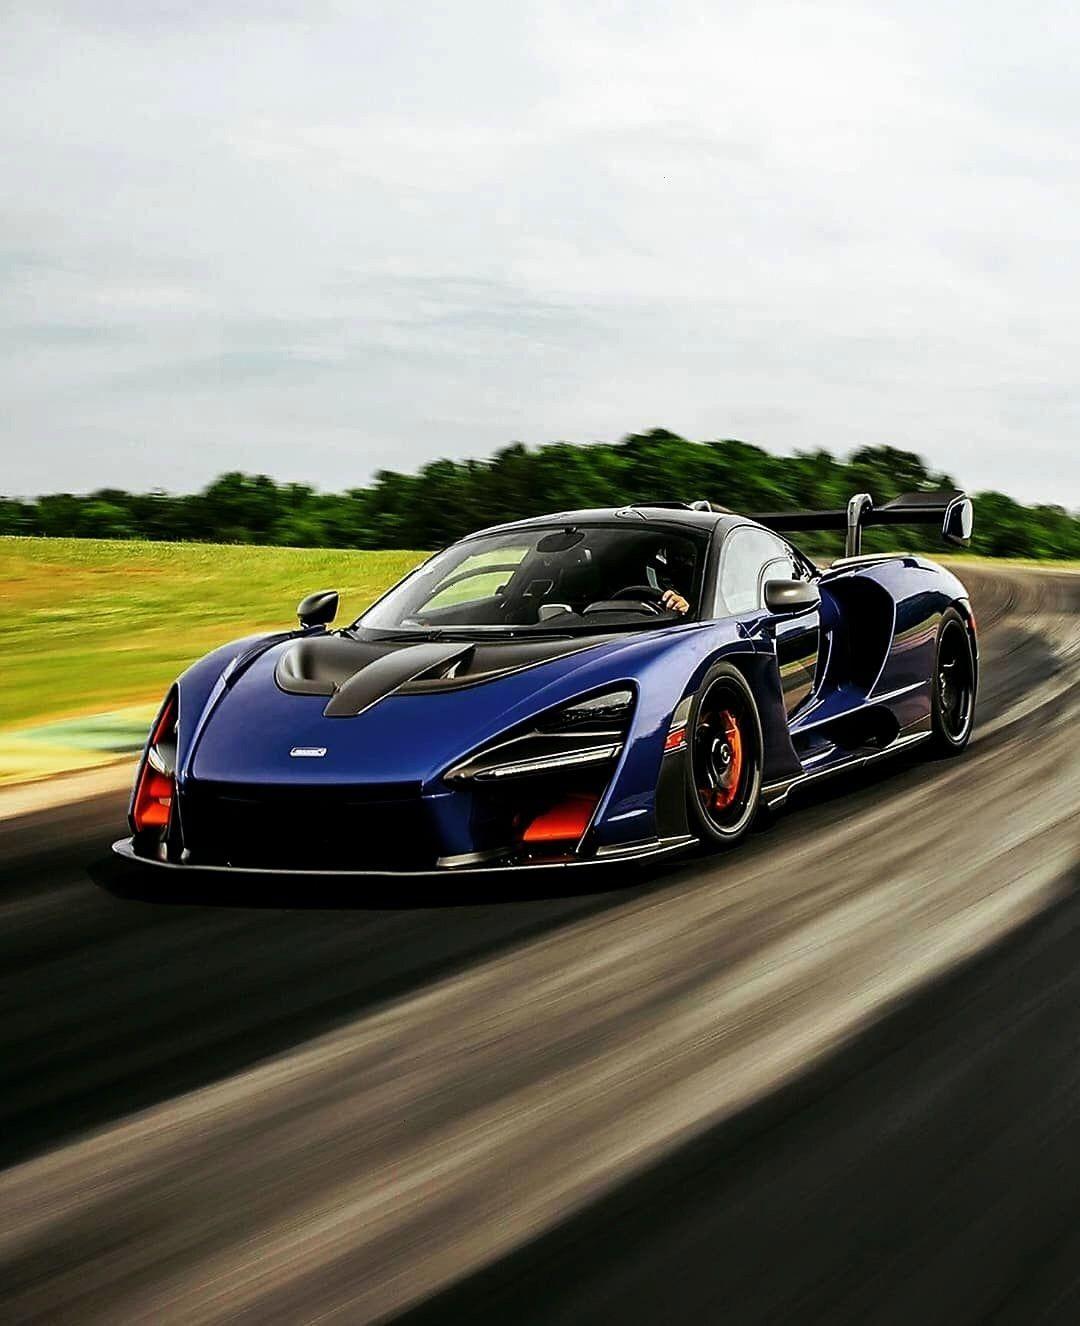 Senna ...McLaren Senna ... The 8 Most Expensive Supercars Of 2014 Lamborghini Veneno Roadster â€